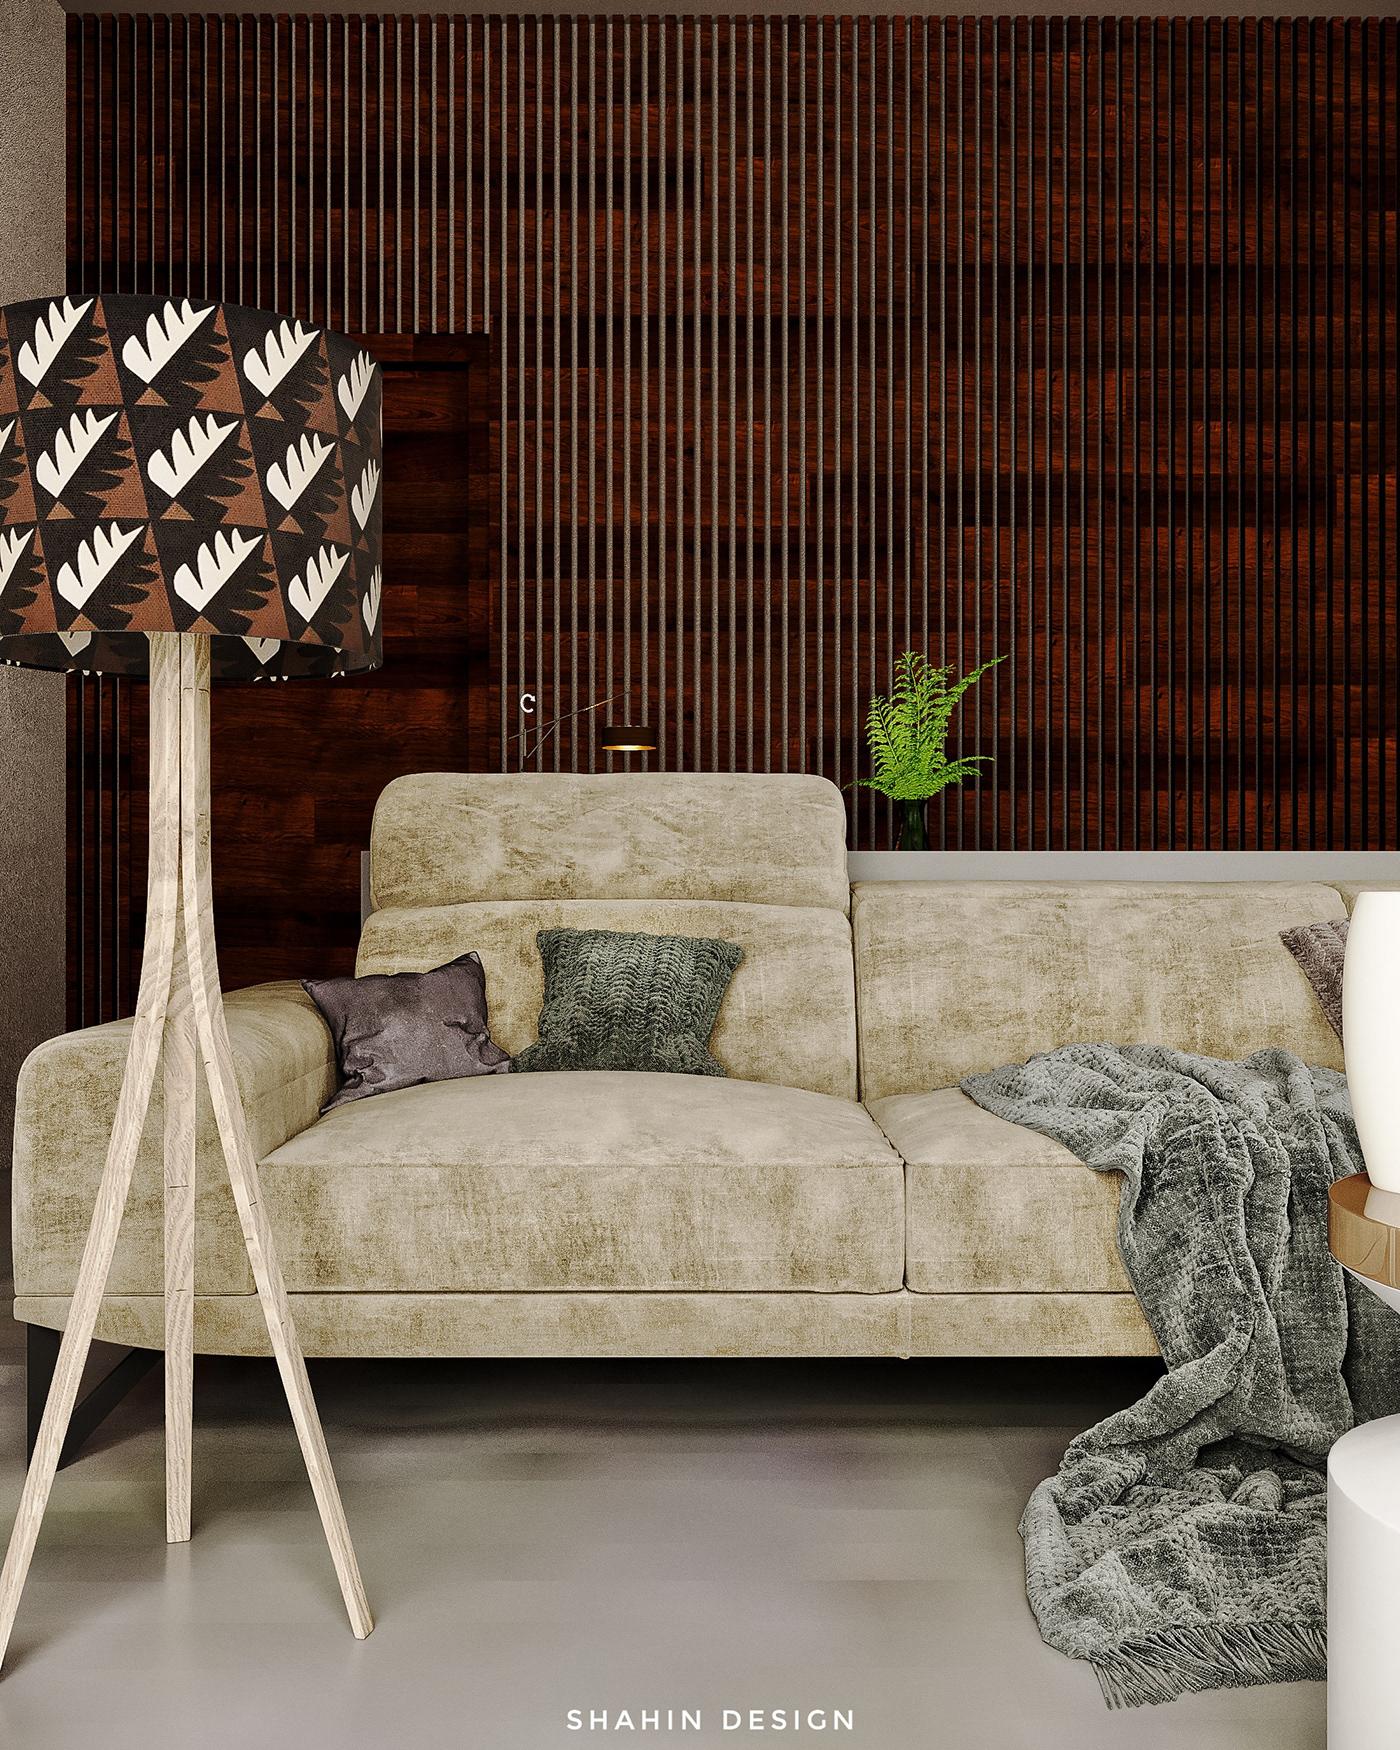 3ds max architectural archviz bedrrom design cg artist CGI corona render  interior design  MODERN BEDRROM visualization